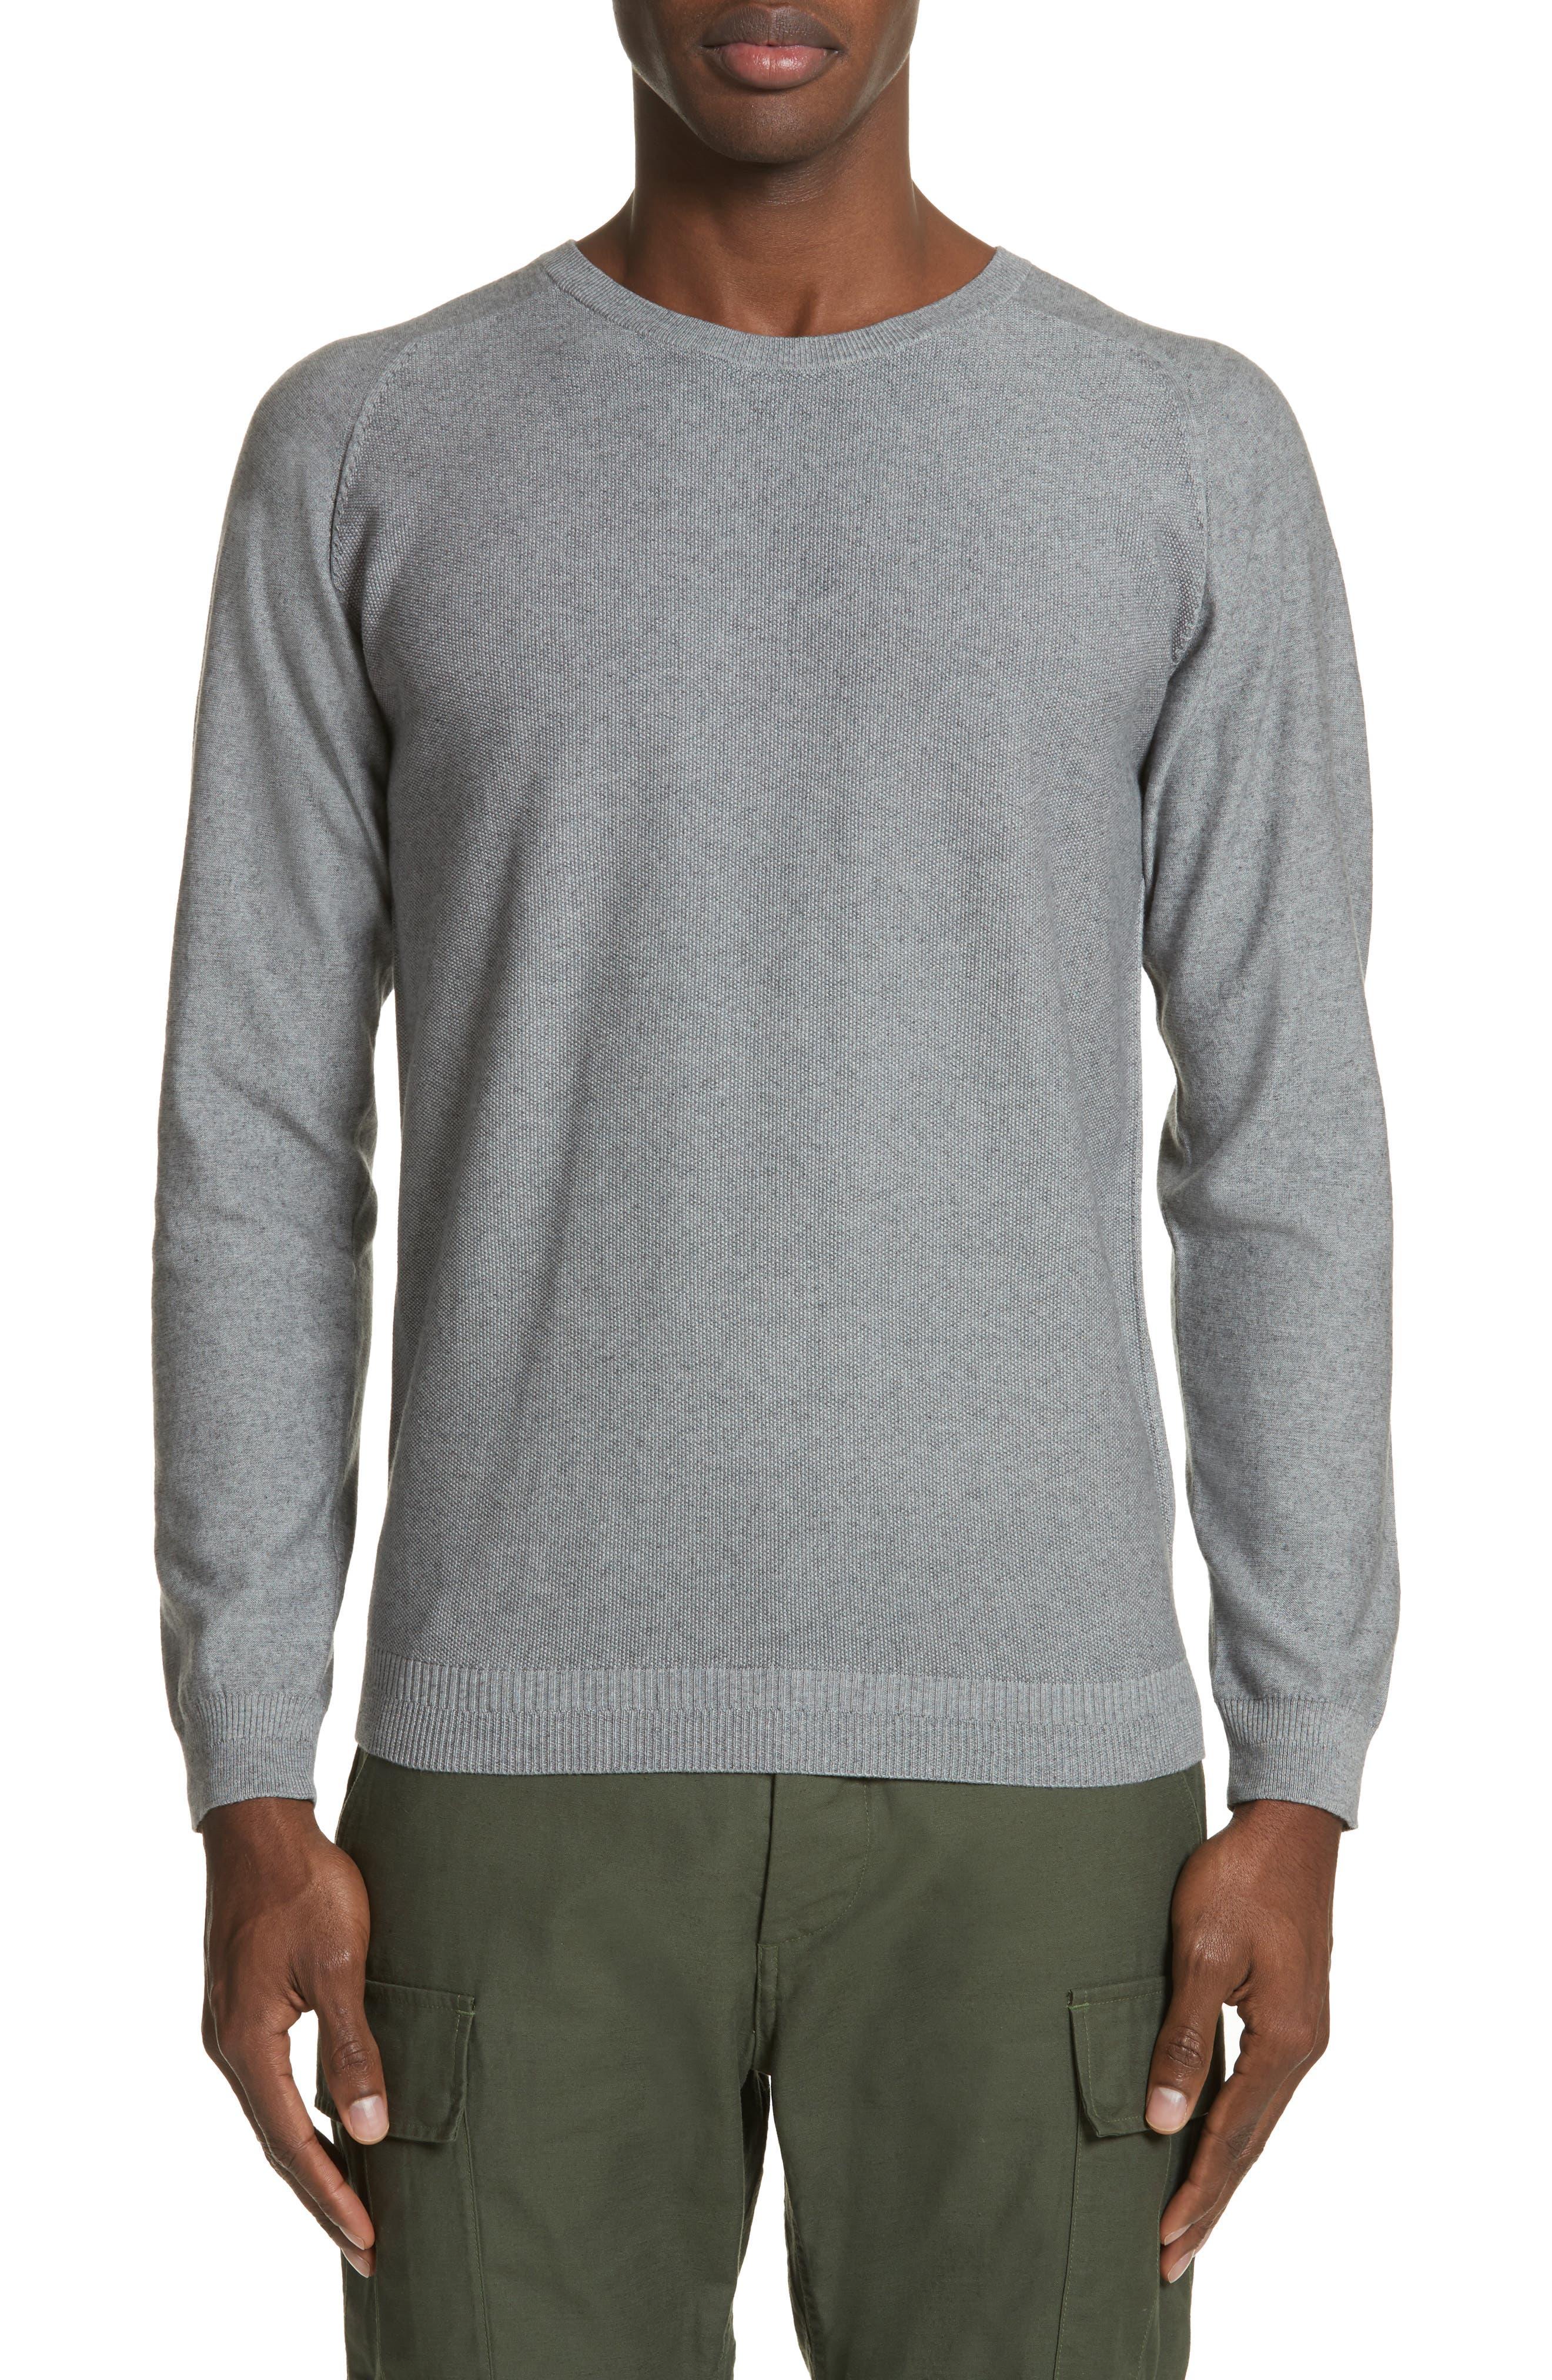 Cotton & Cashmere Sweater,                             Main thumbnail 1, color,                             Heather Grey